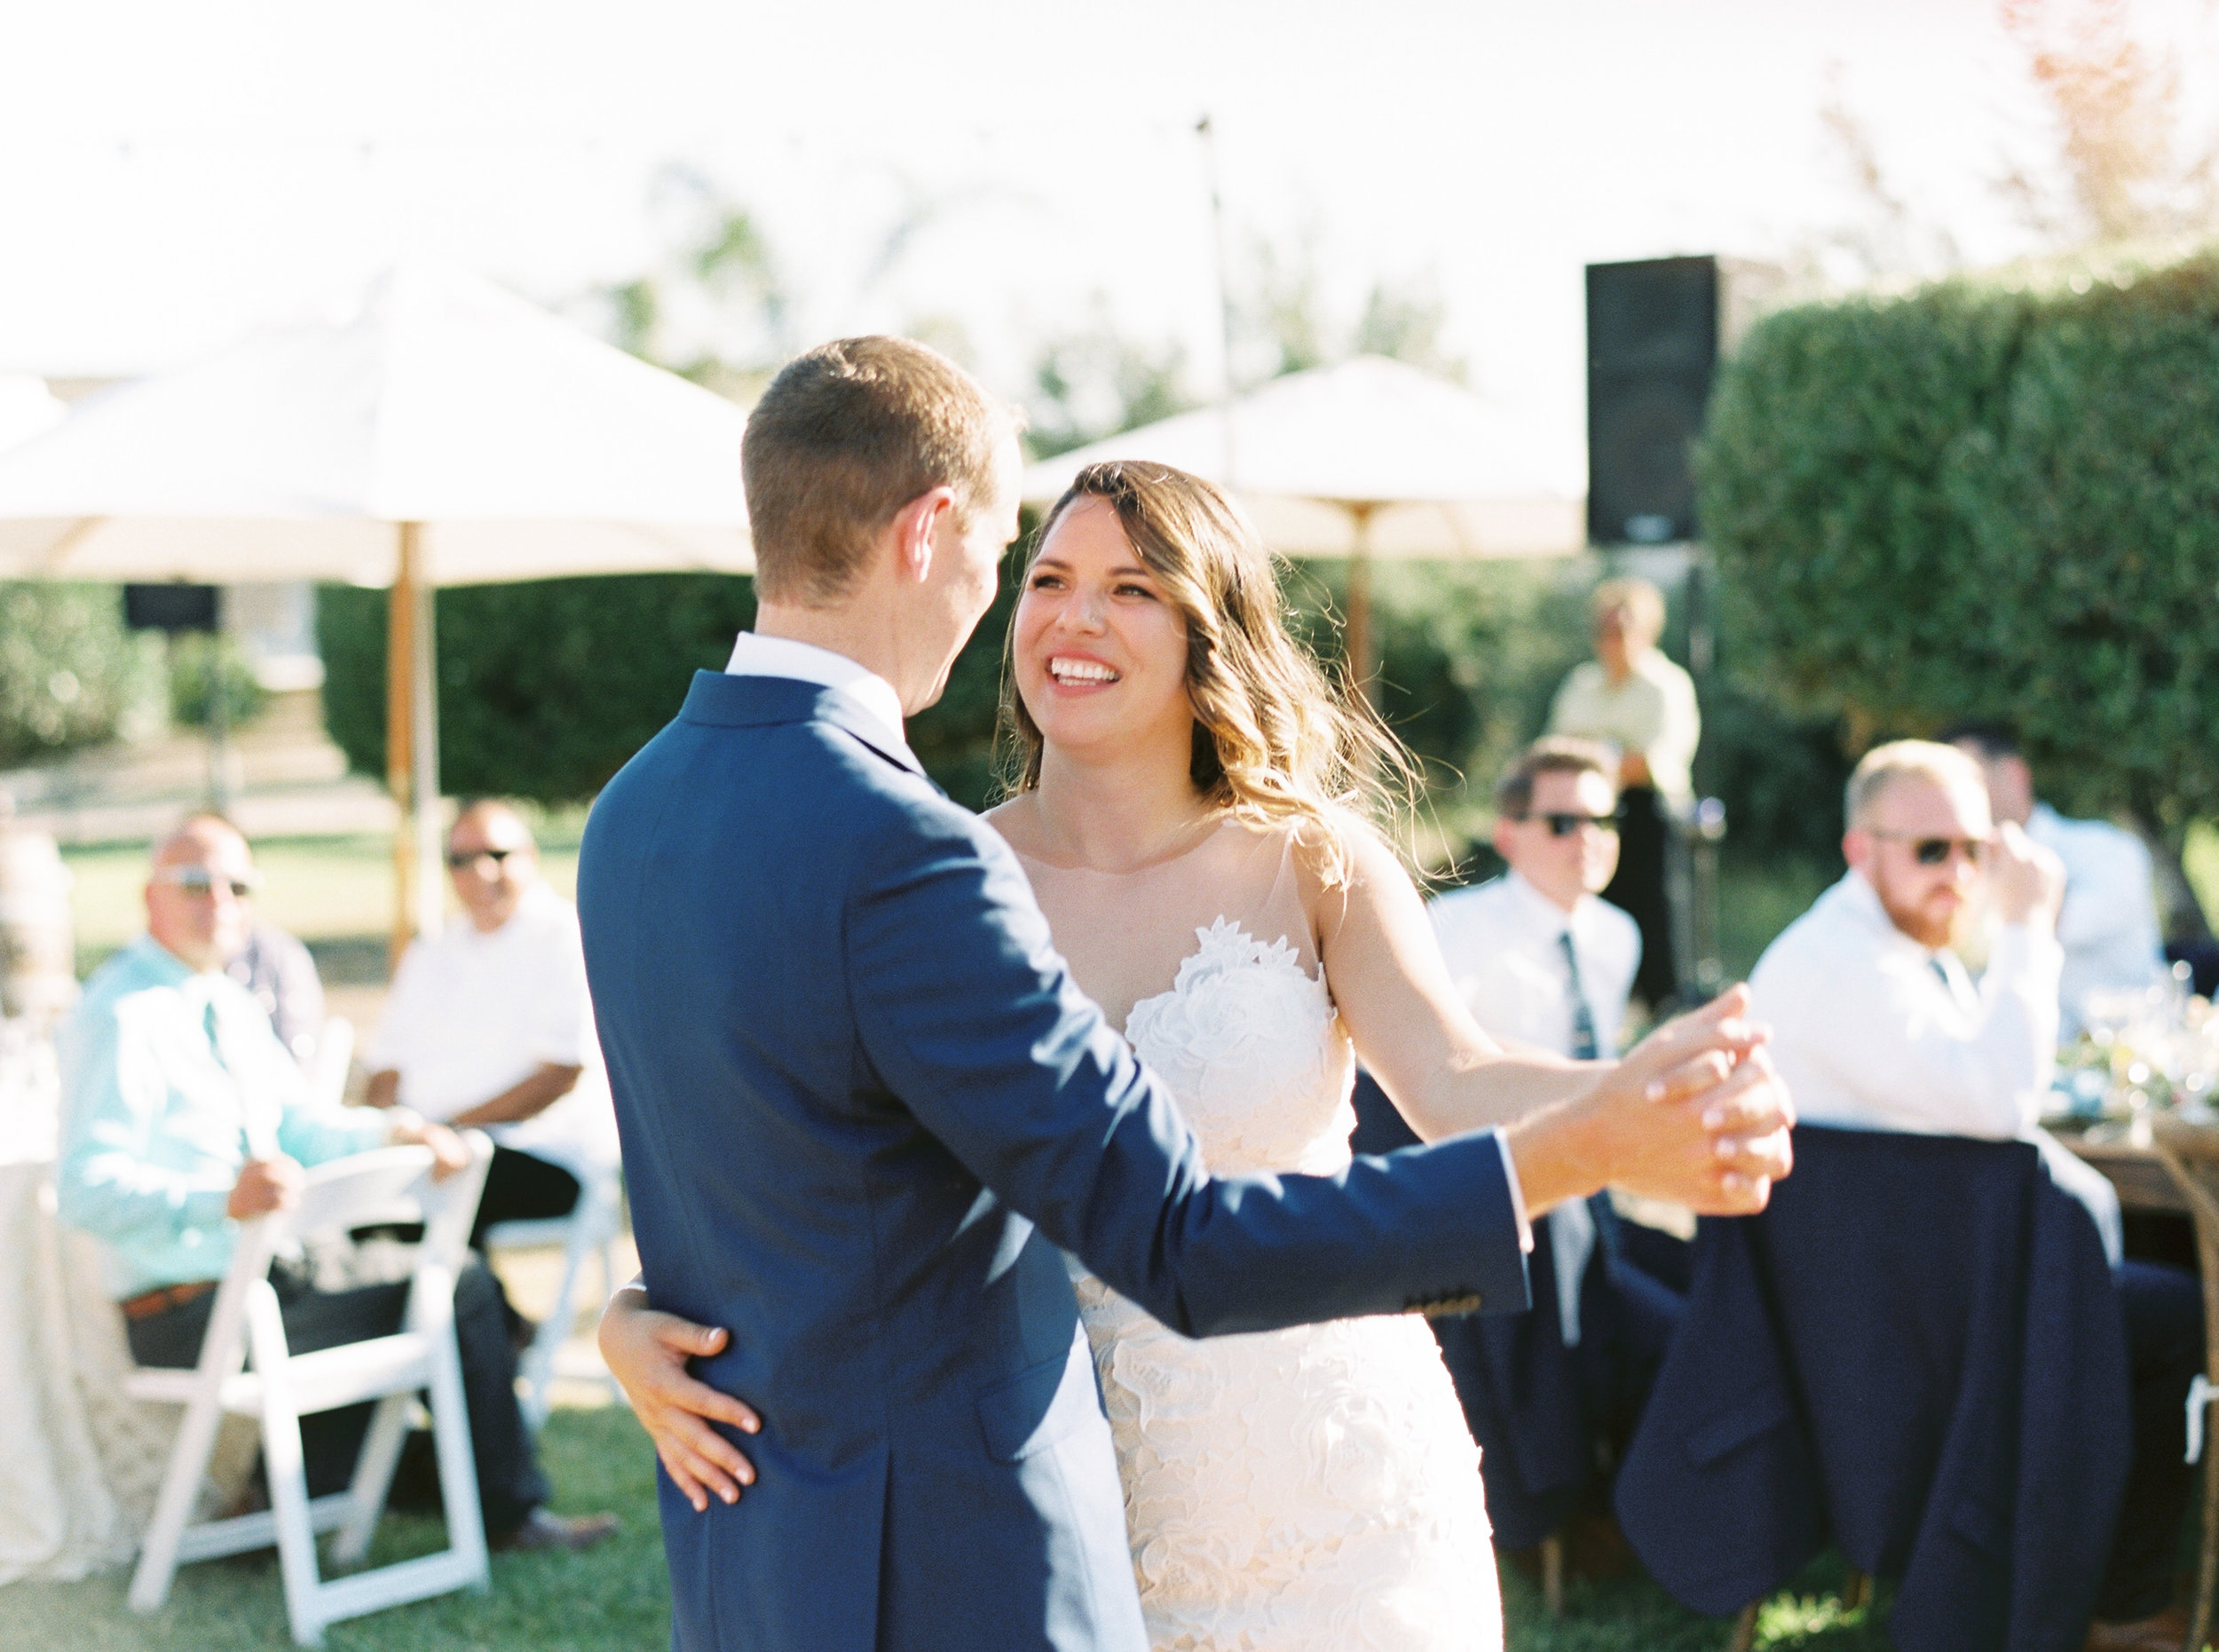 the-purple-orchid-resort-wedding-in-livermore-california-119.jpg